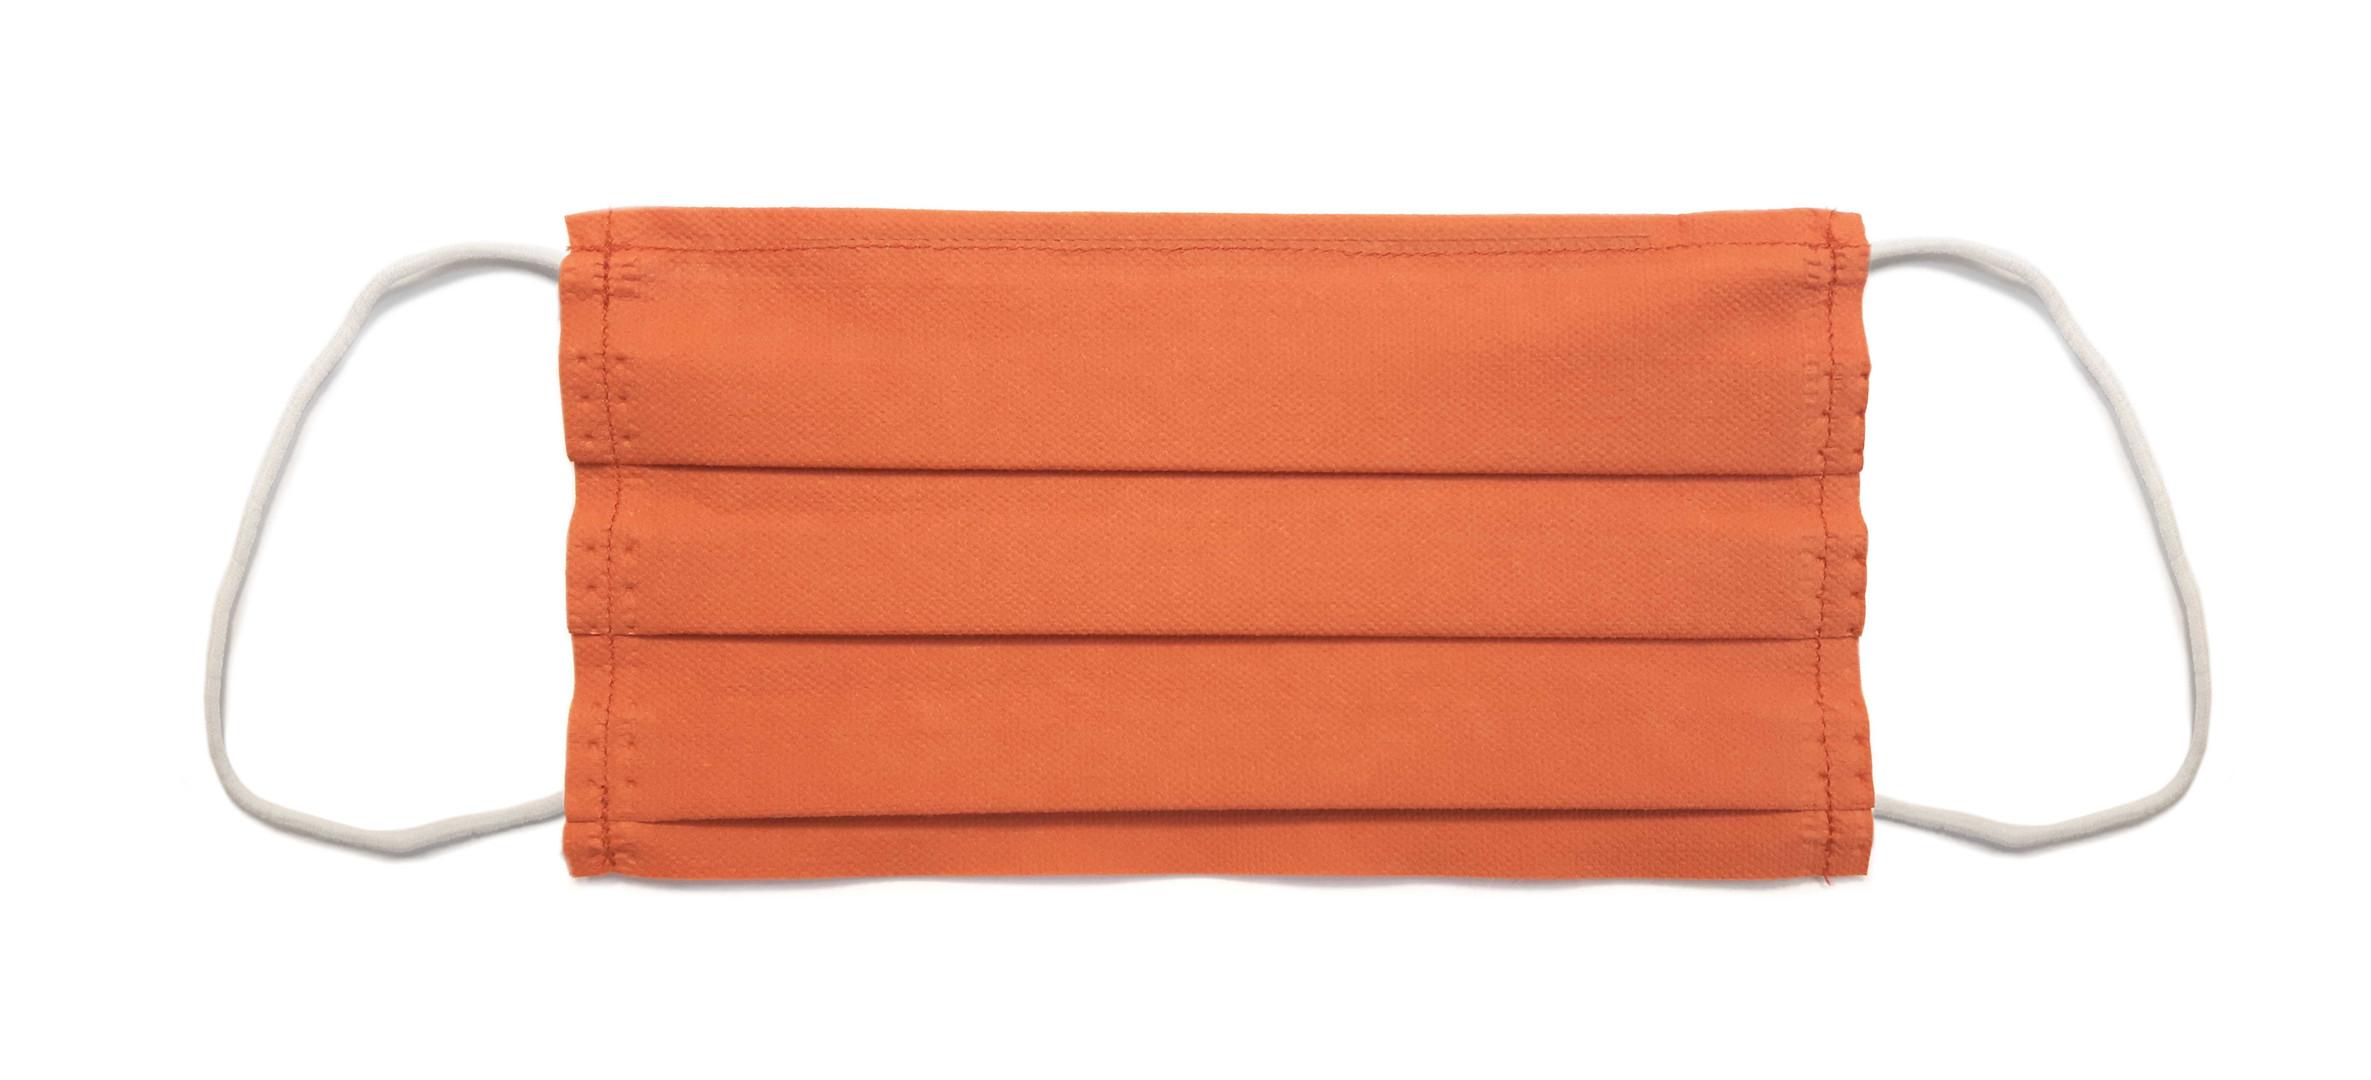 orange (660)_1.jpg